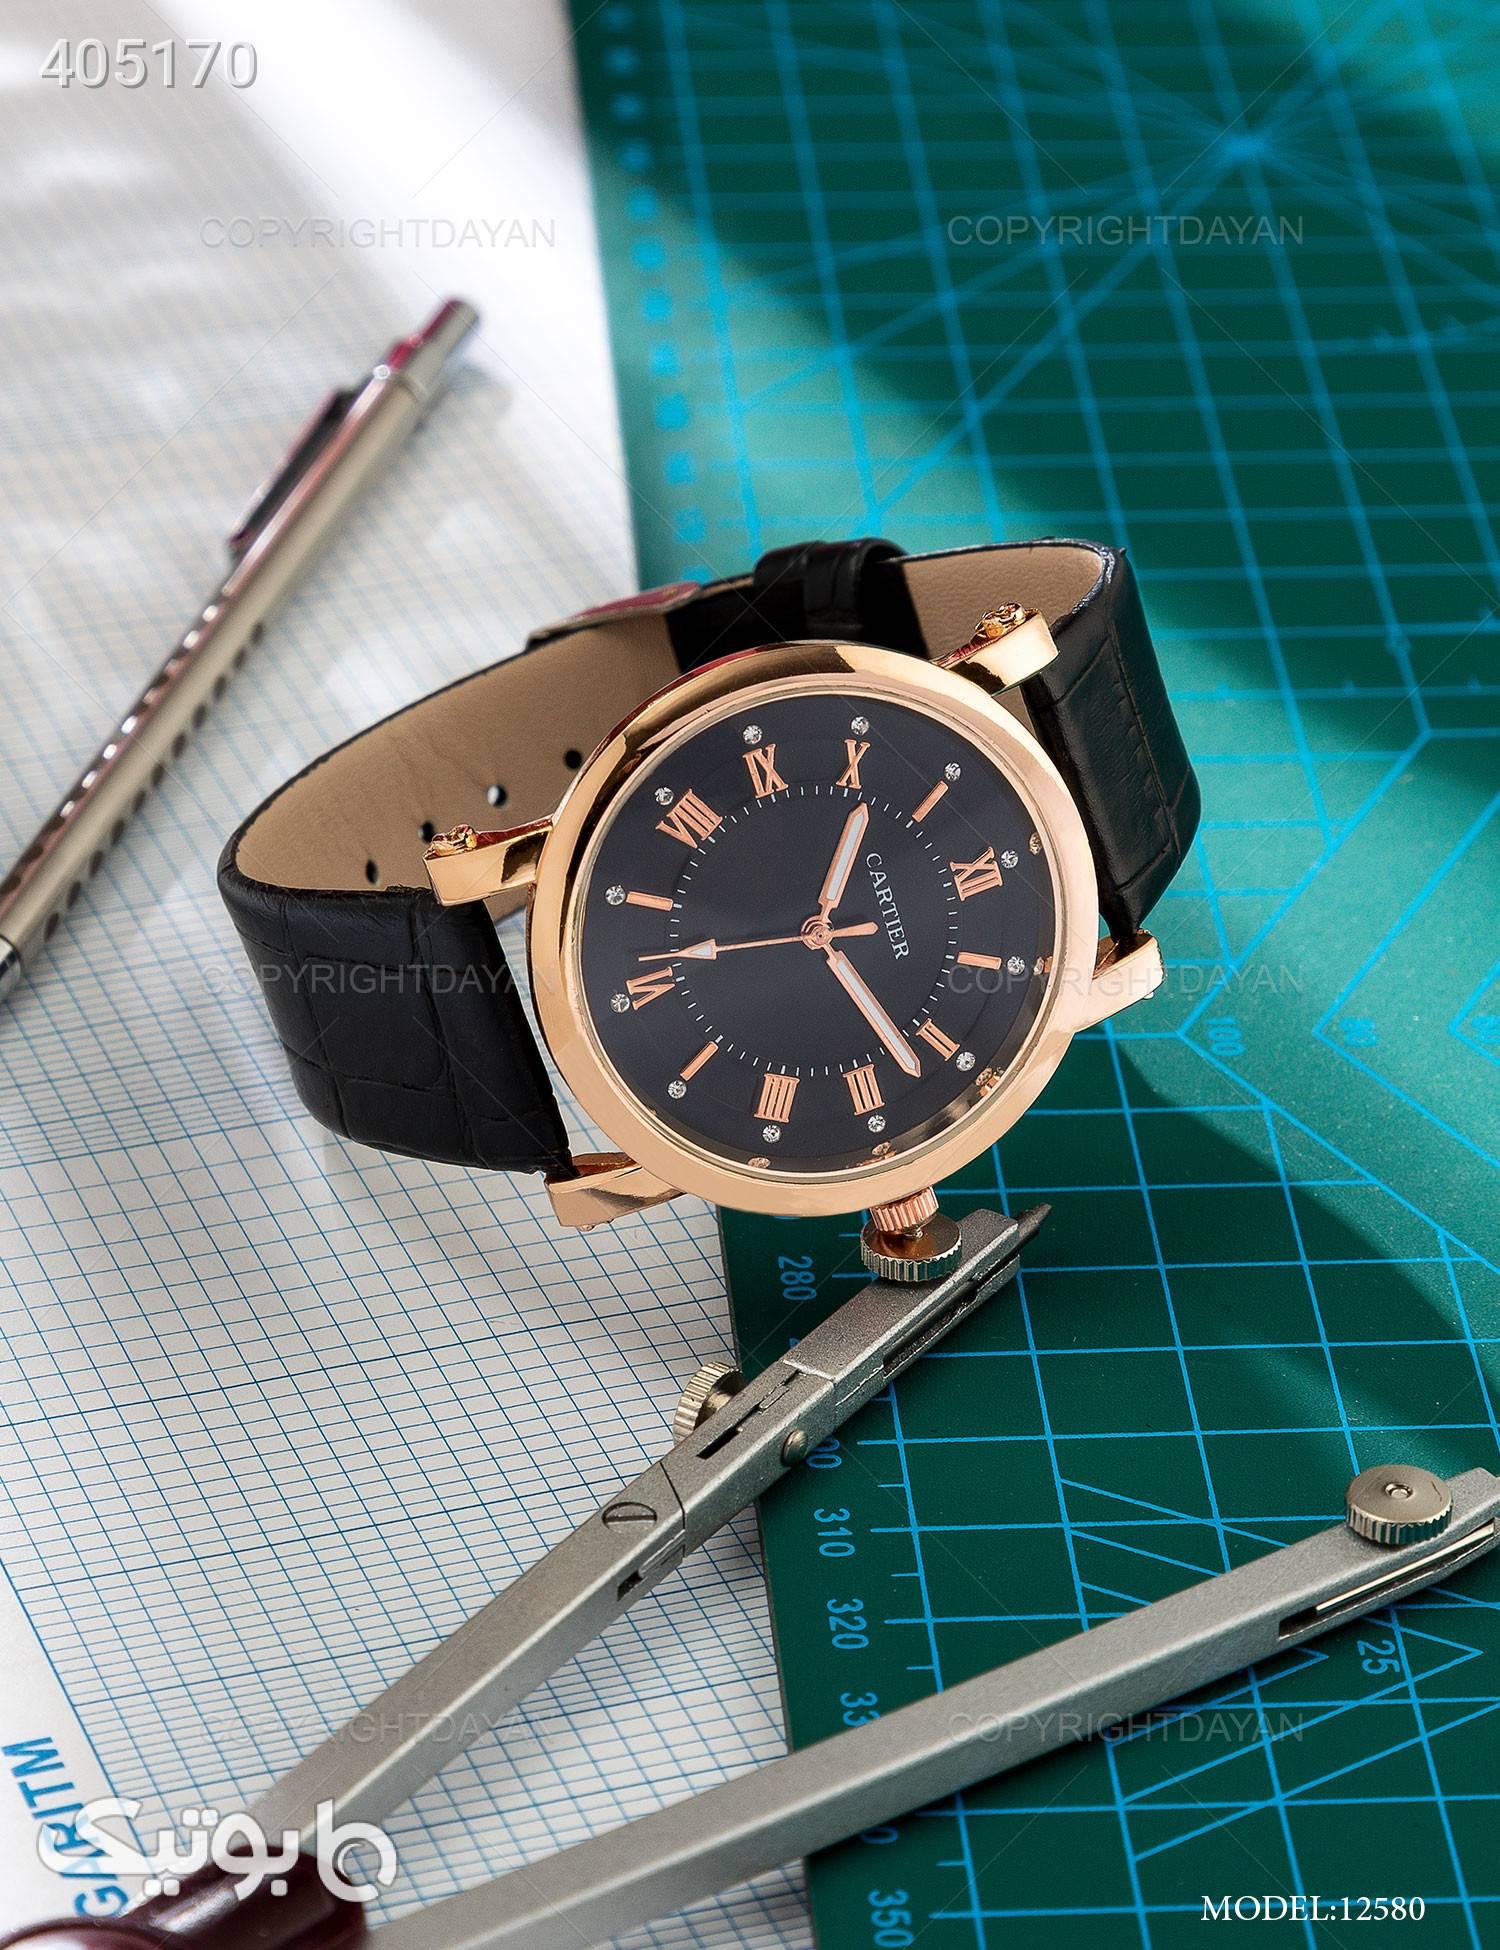 ساعت مچی Cartier مدل 12580 مشکی ساعت